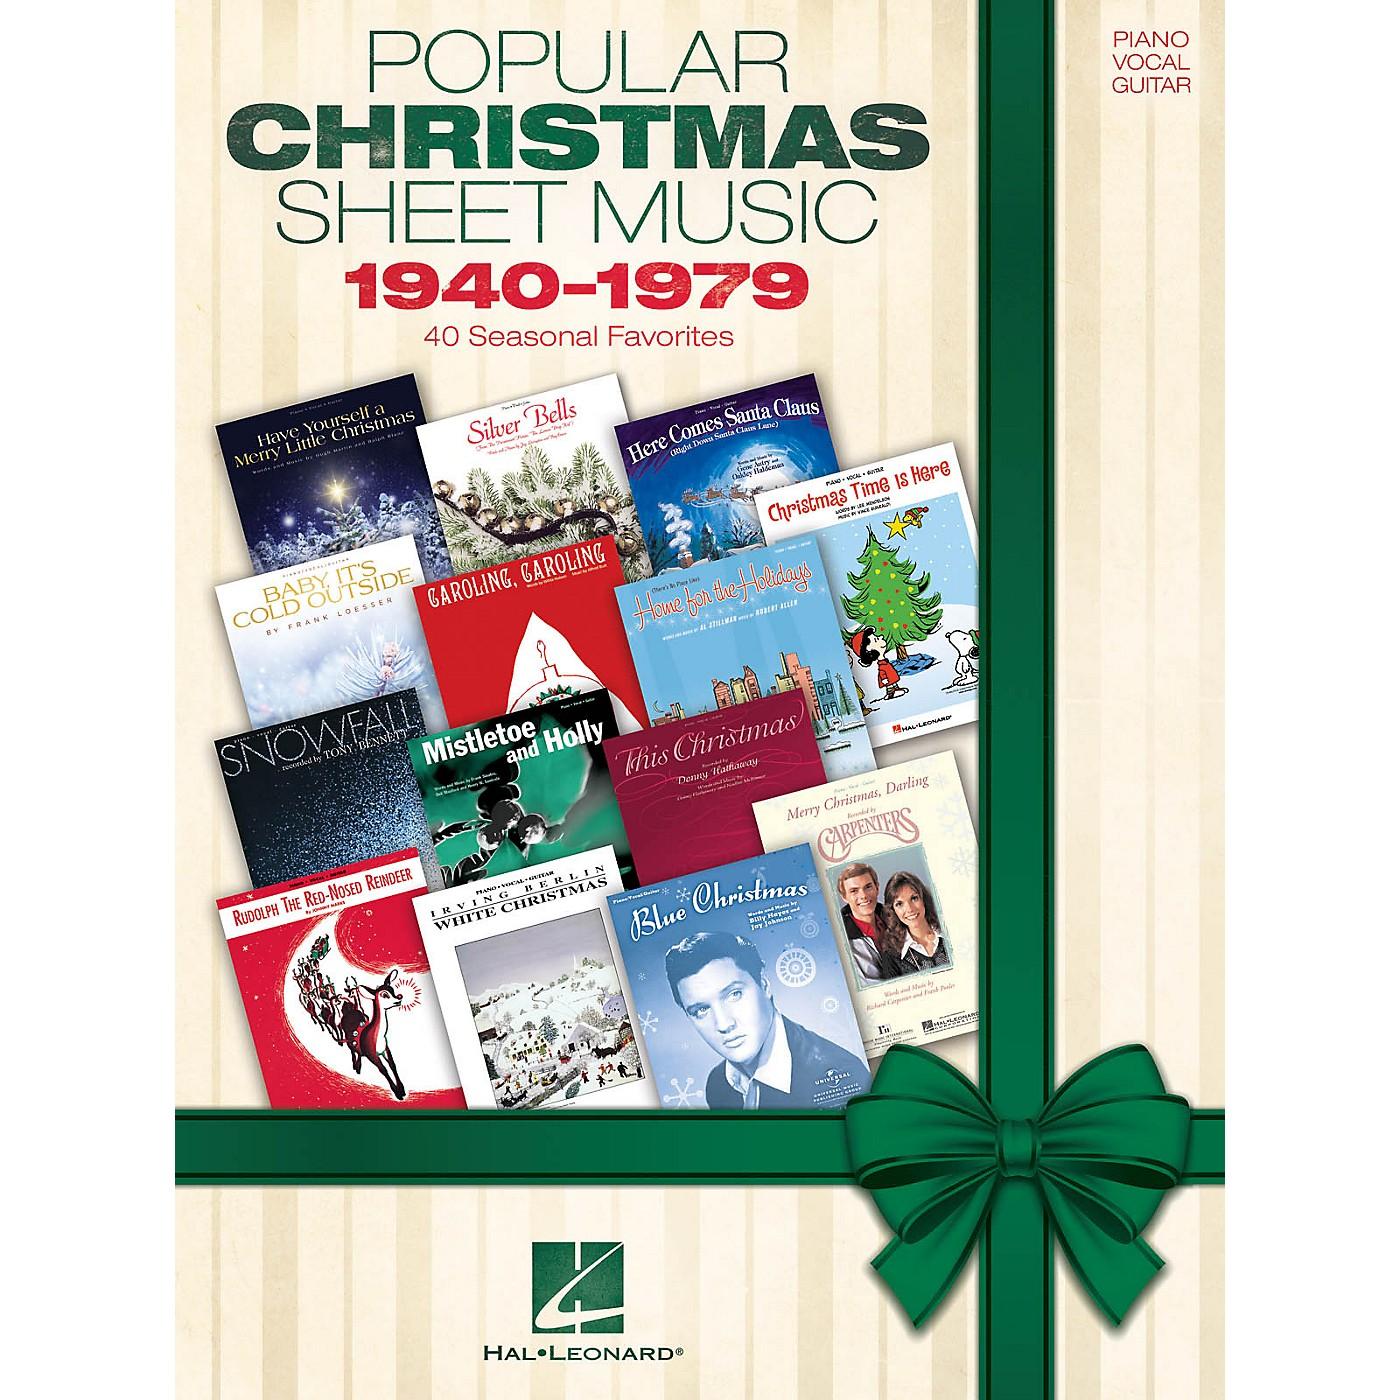 Hal Leonard Popular Christmas Sheet Music: 1940-1979 Piano/Vocal/Guitar Songbook thumbnail